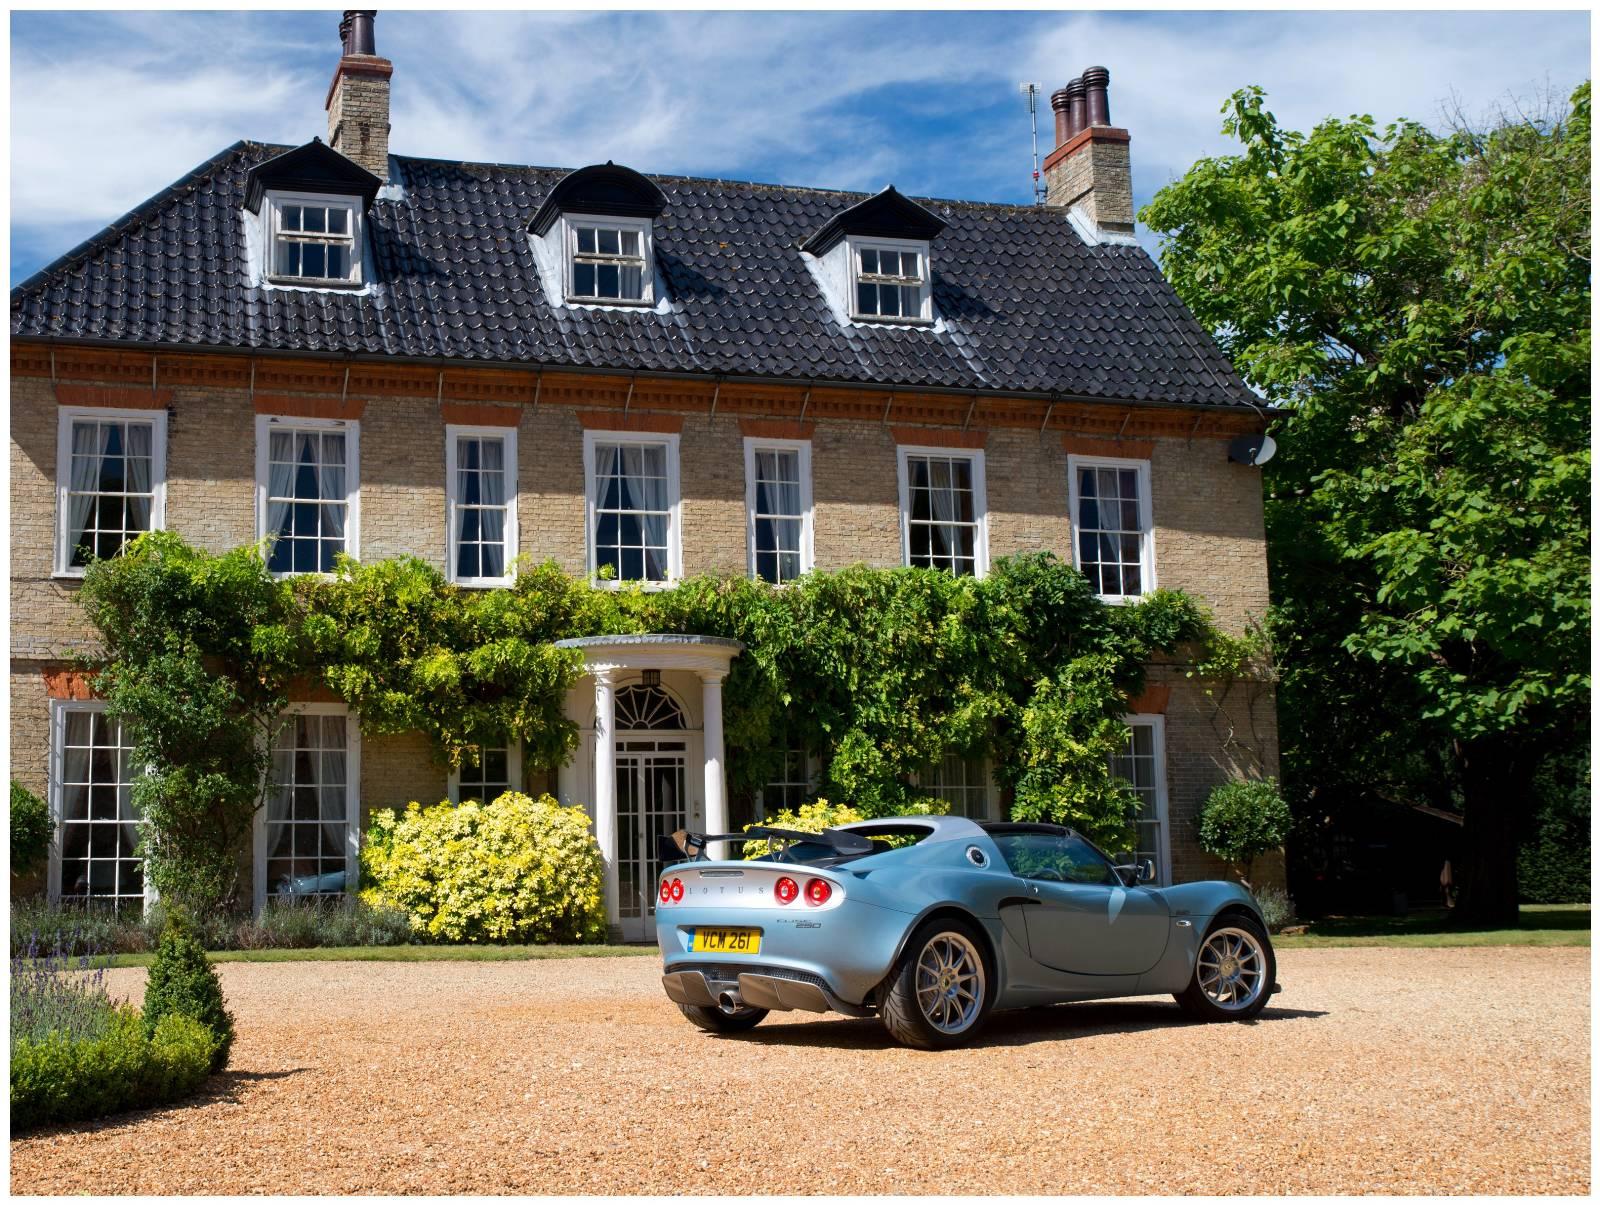 2016 Lotus Elise 250 Special Edition